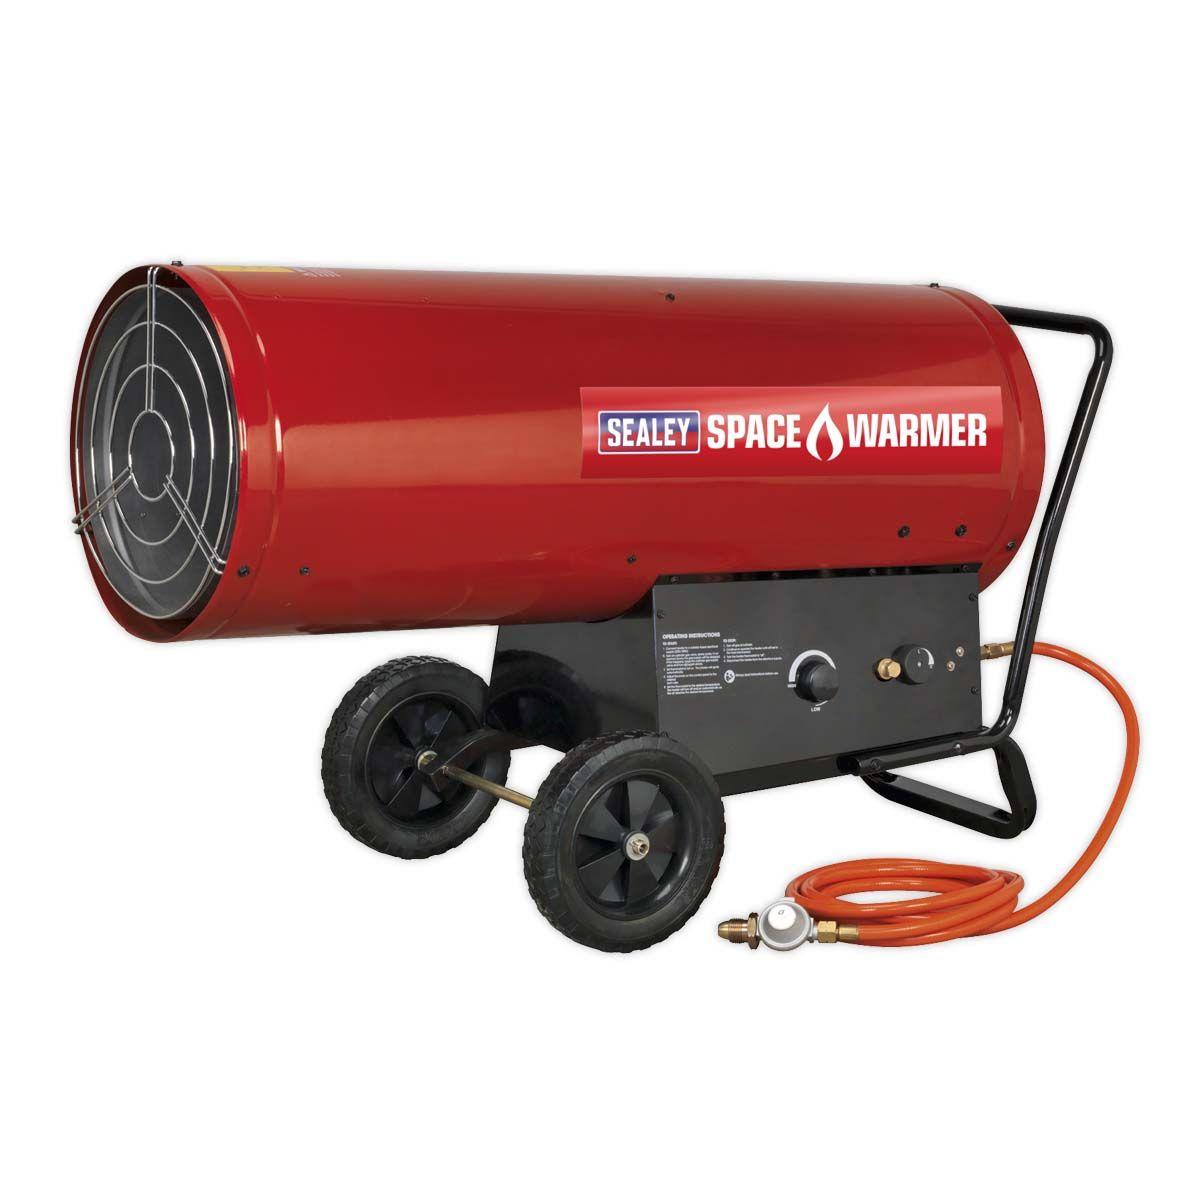 Sealey LP401 Space Warmer 400,000 Btu Propane Heater